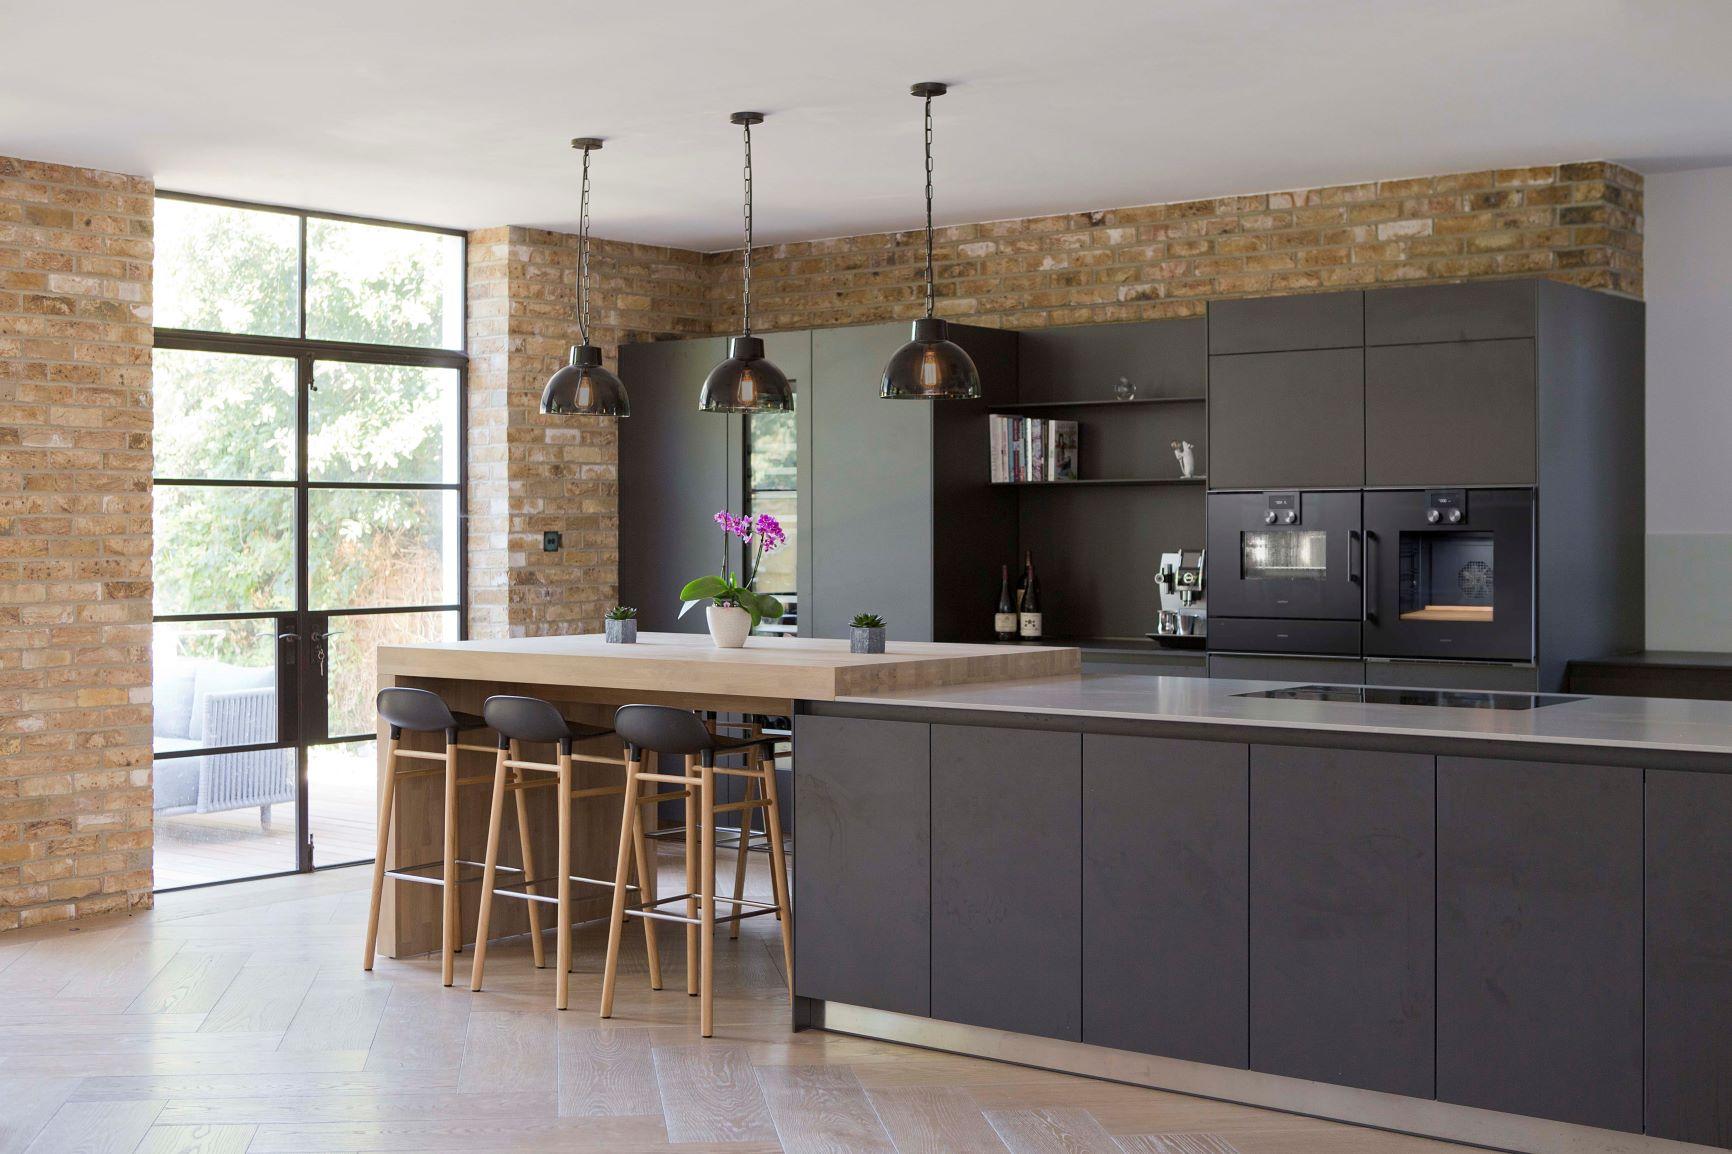 Kitchen Extension, Barnes, London, RBA